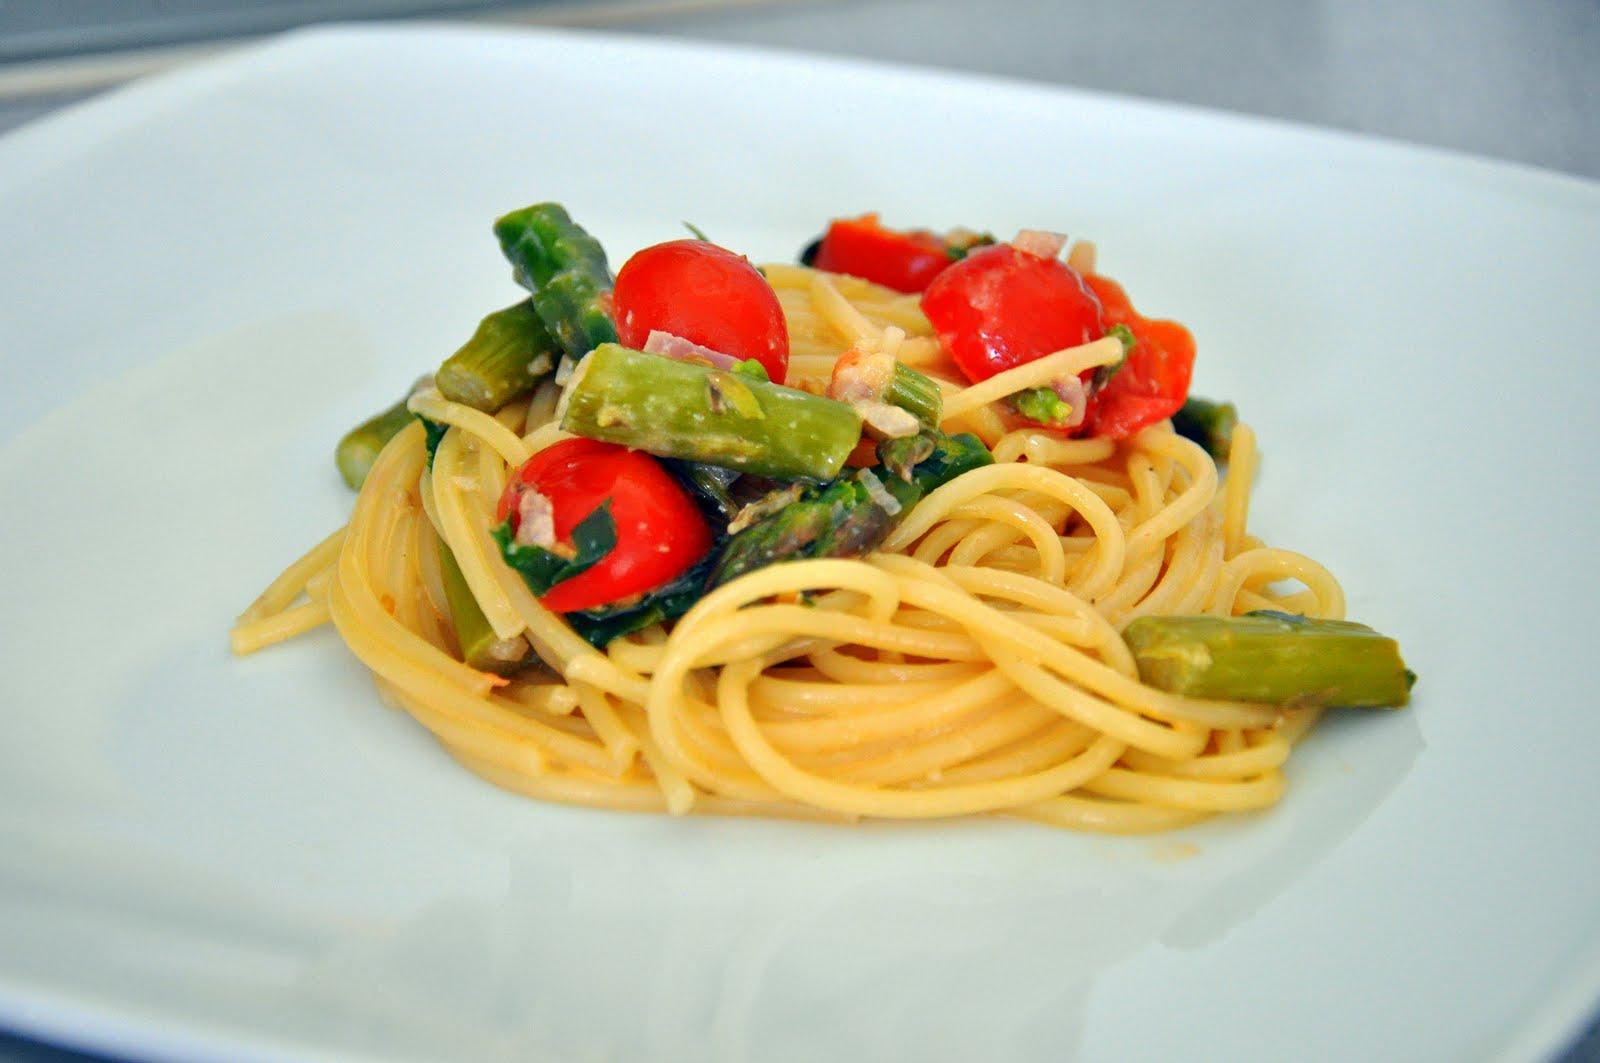 %25C5%25A1pageti+s+%25C5%25A1parglji_2.jpg